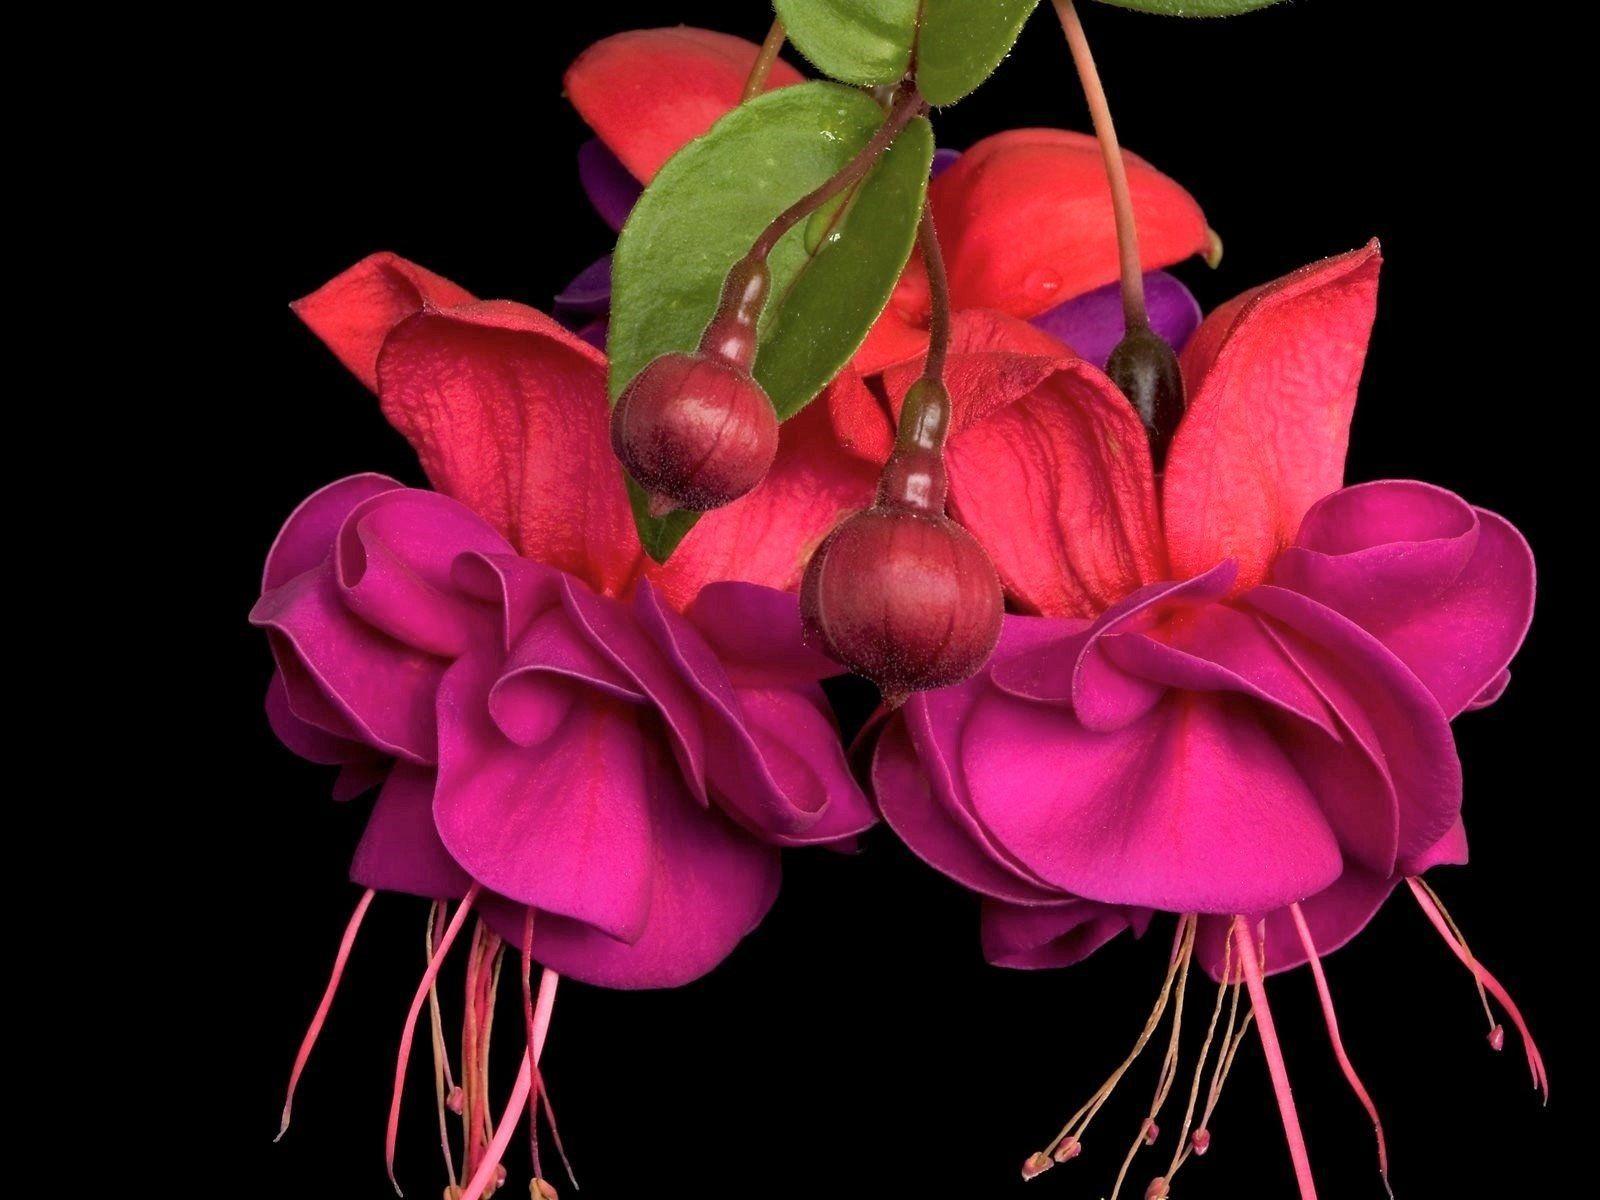 Pretty Flower Earth Fuchsia Flowers Flower Purple Flower Wallpaper Earth Flower Flowers Fuchsia Pre In 2020 Purple Flowers Wallpaper Fuchsia Flowers Pretty Flowers